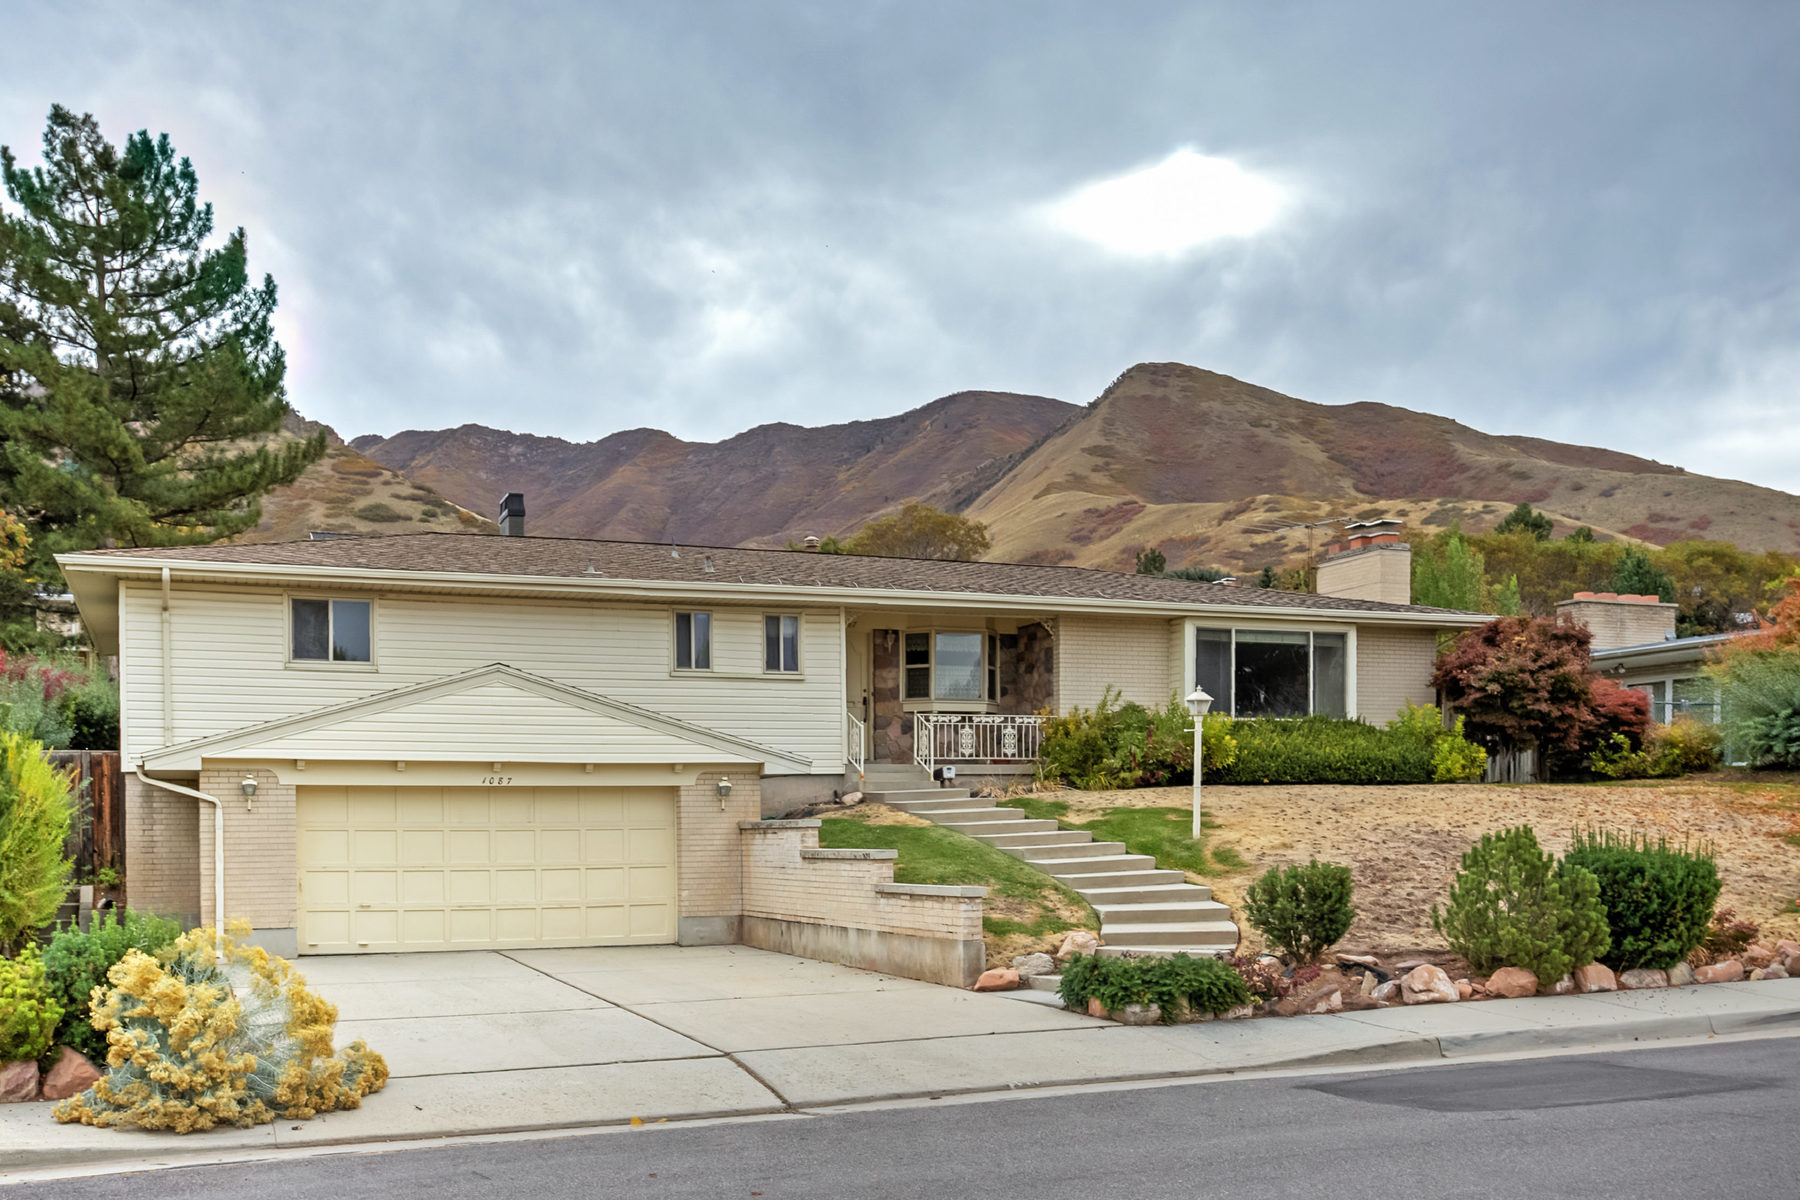 独户住宅 为 销售 在 Amazing Potential 1087 S Bonneville Dr 盐湖城市, 犹他州, 84108 美国